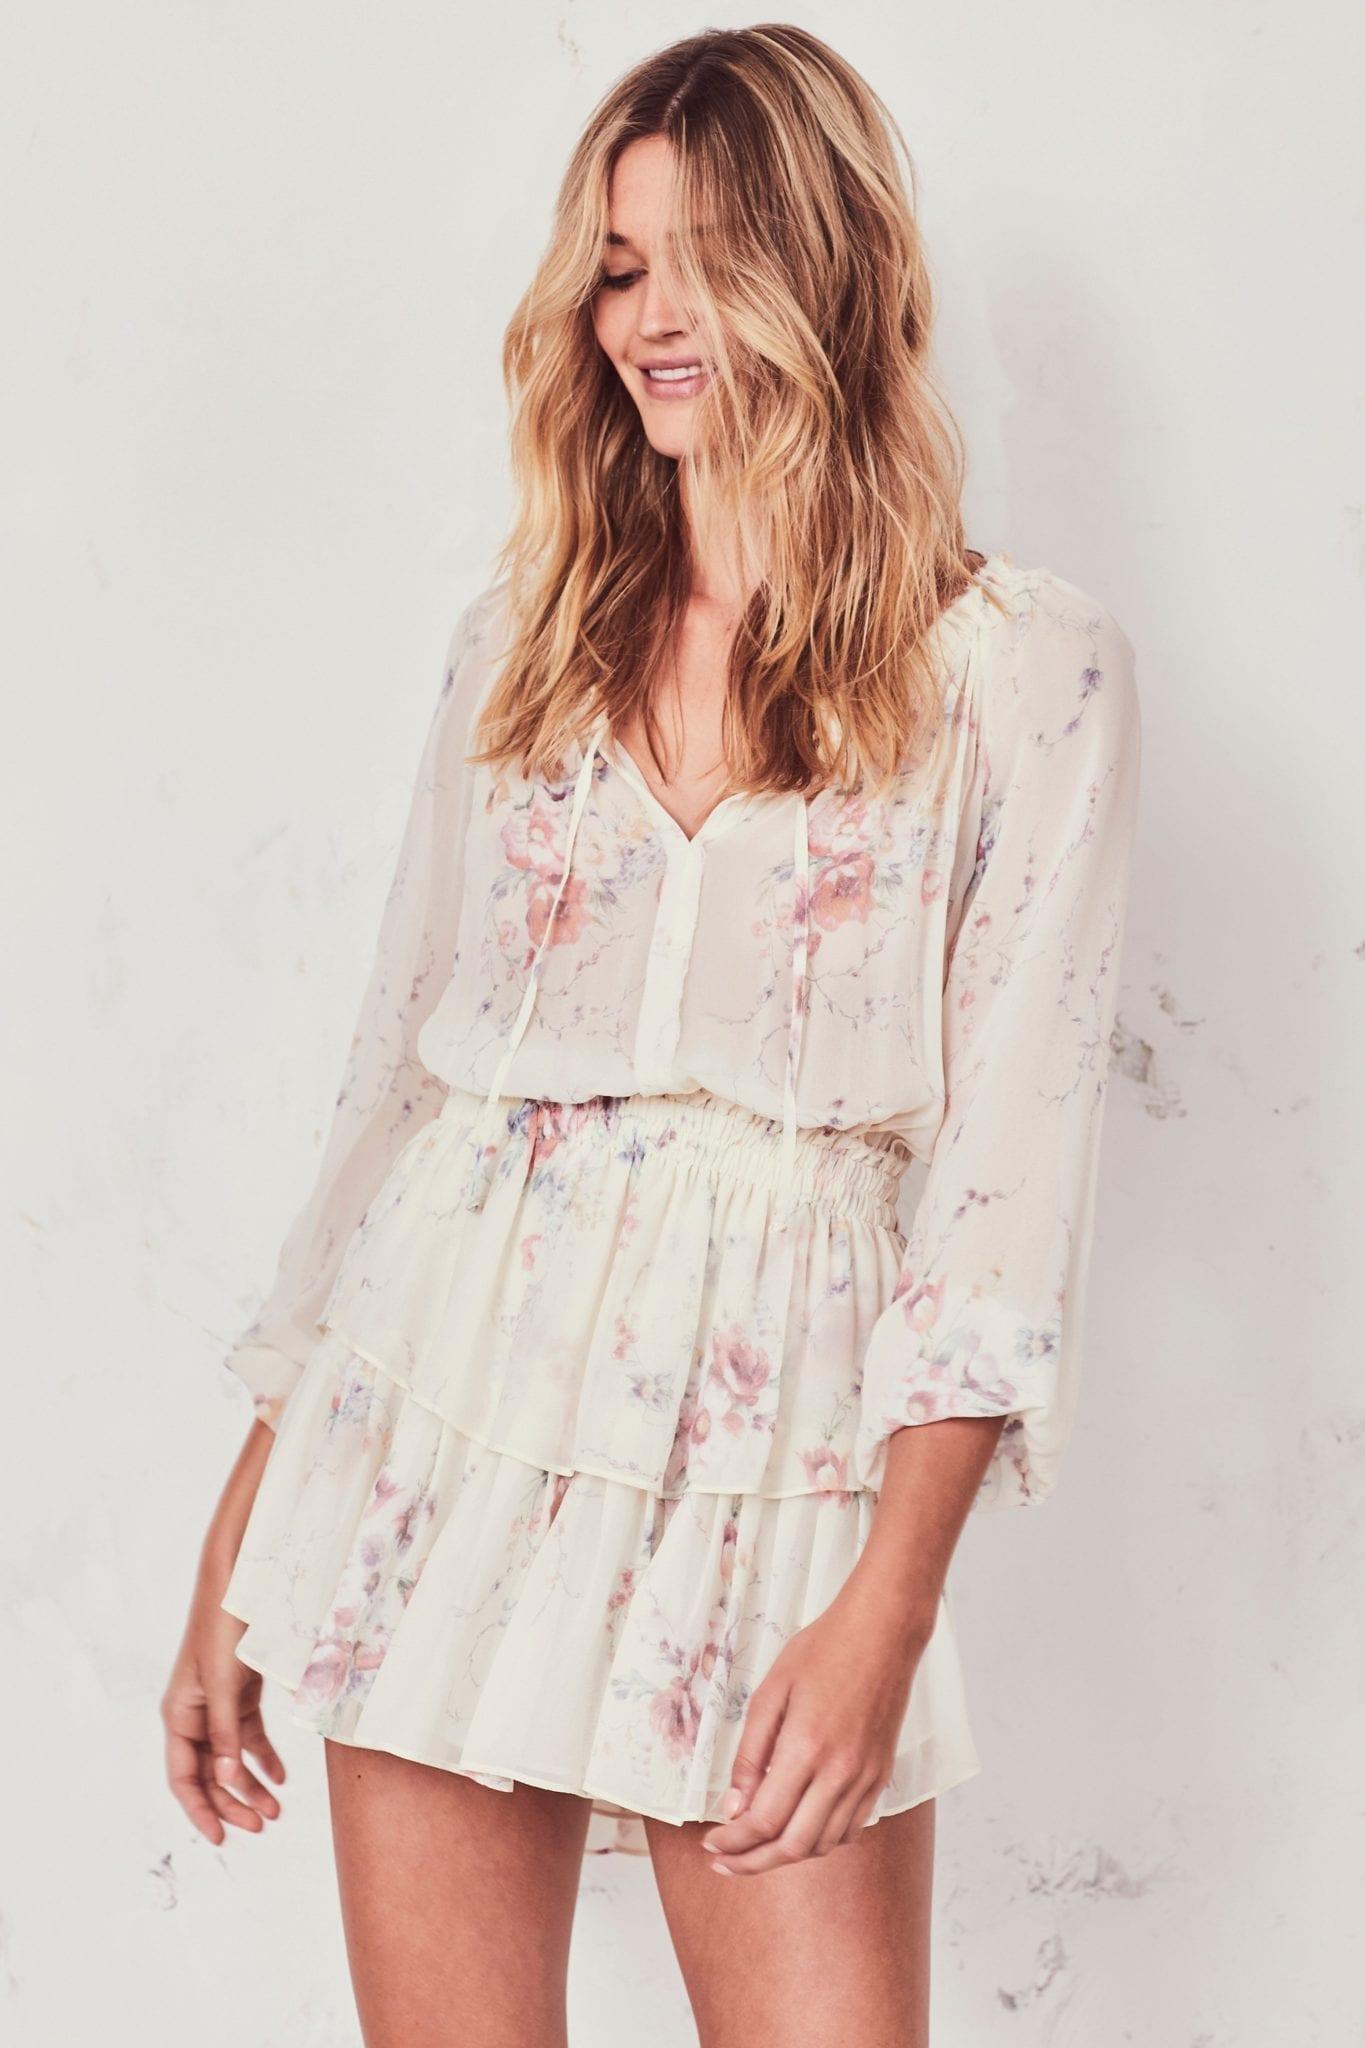 LOVESHACKFANCY Popover White / Floral Printed Dress